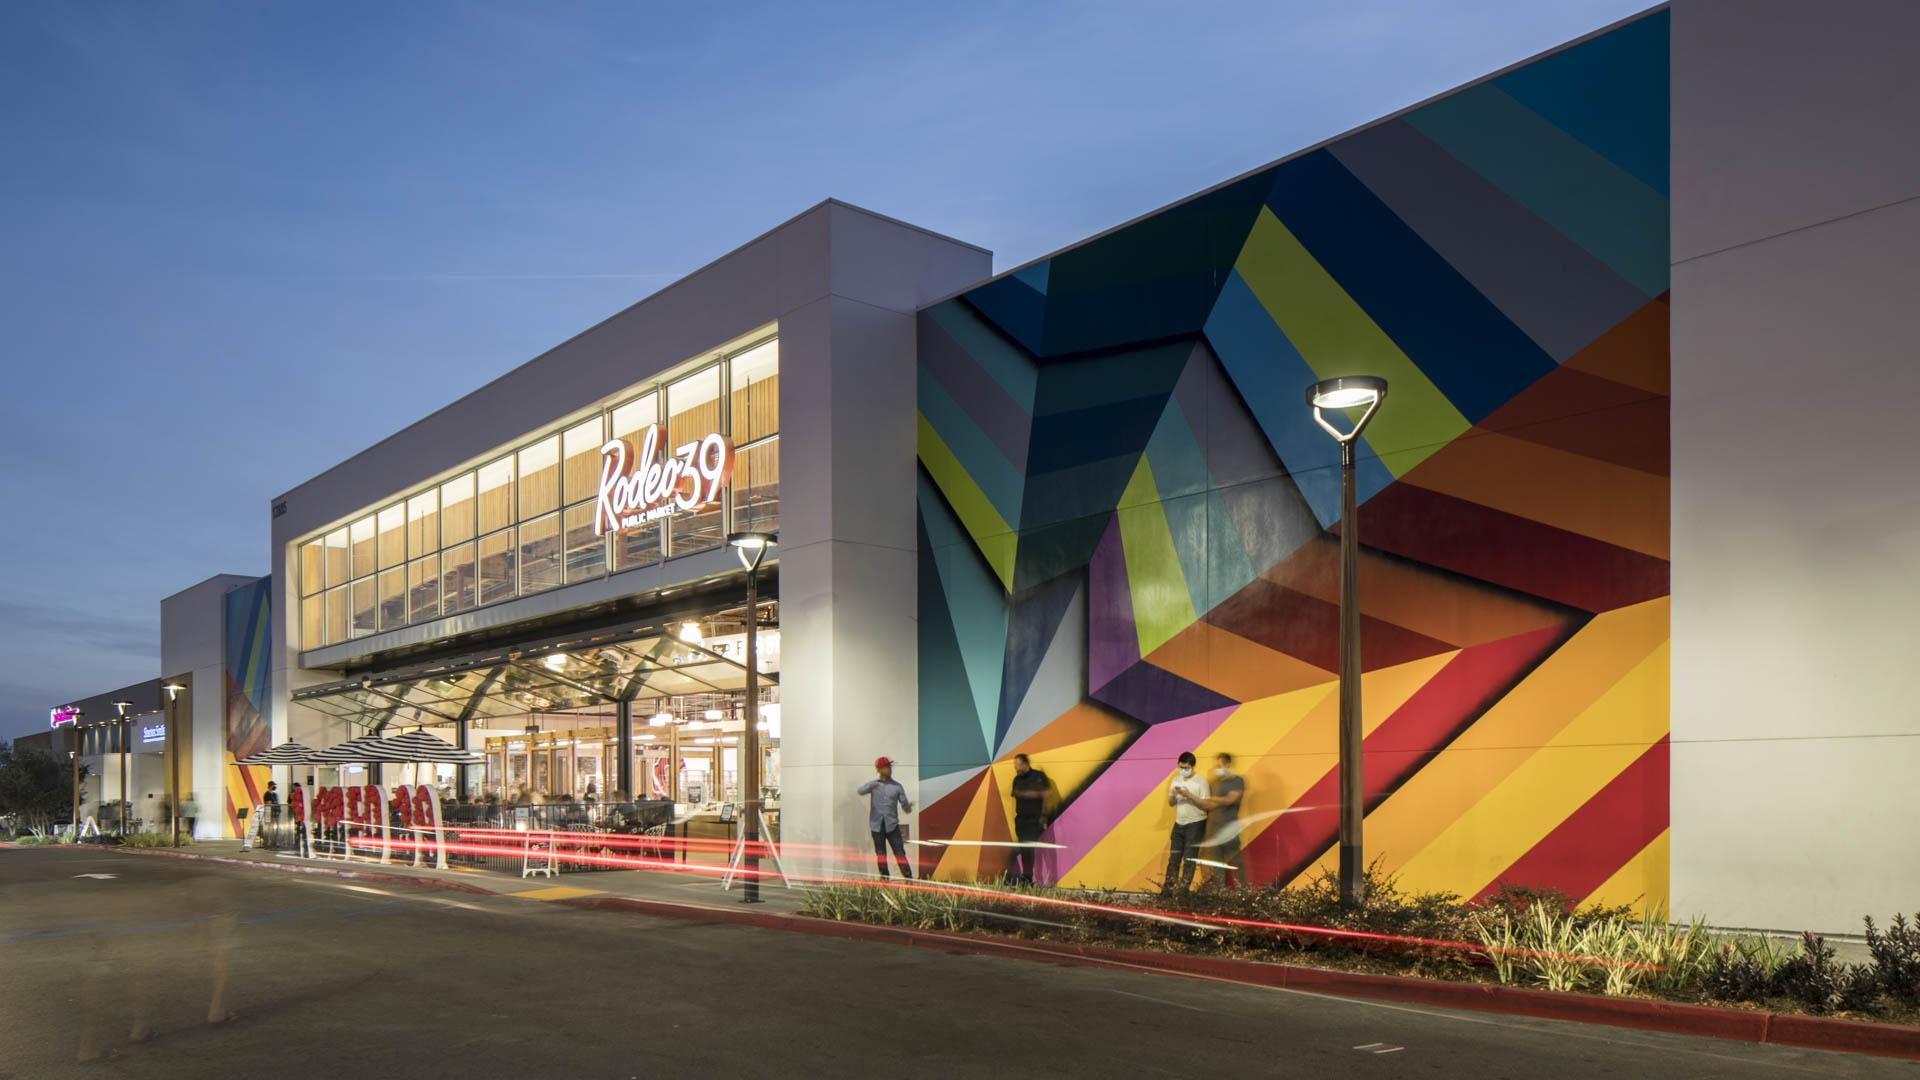 Rodeo 39 landscape Architecture Commercial retail space SWA design